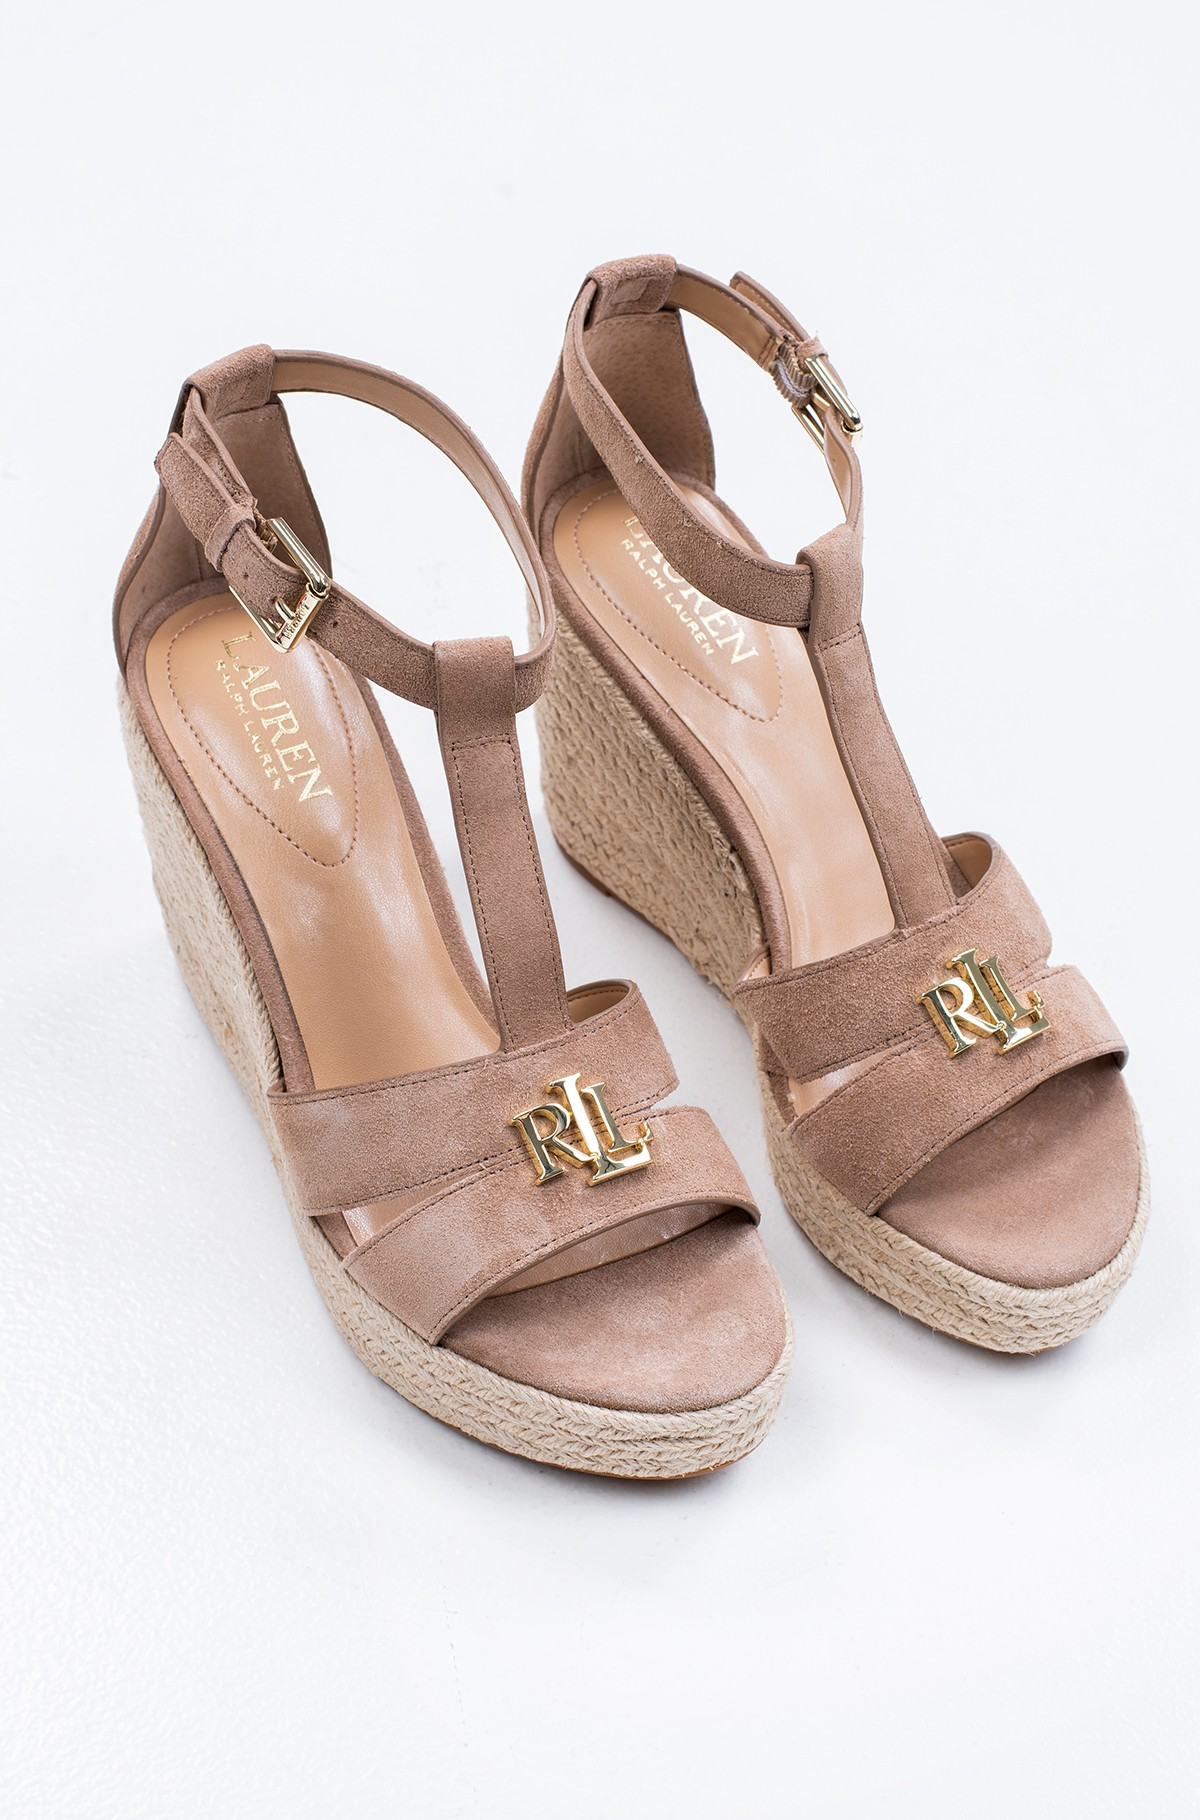 Platform shoes 802783129001-full-1